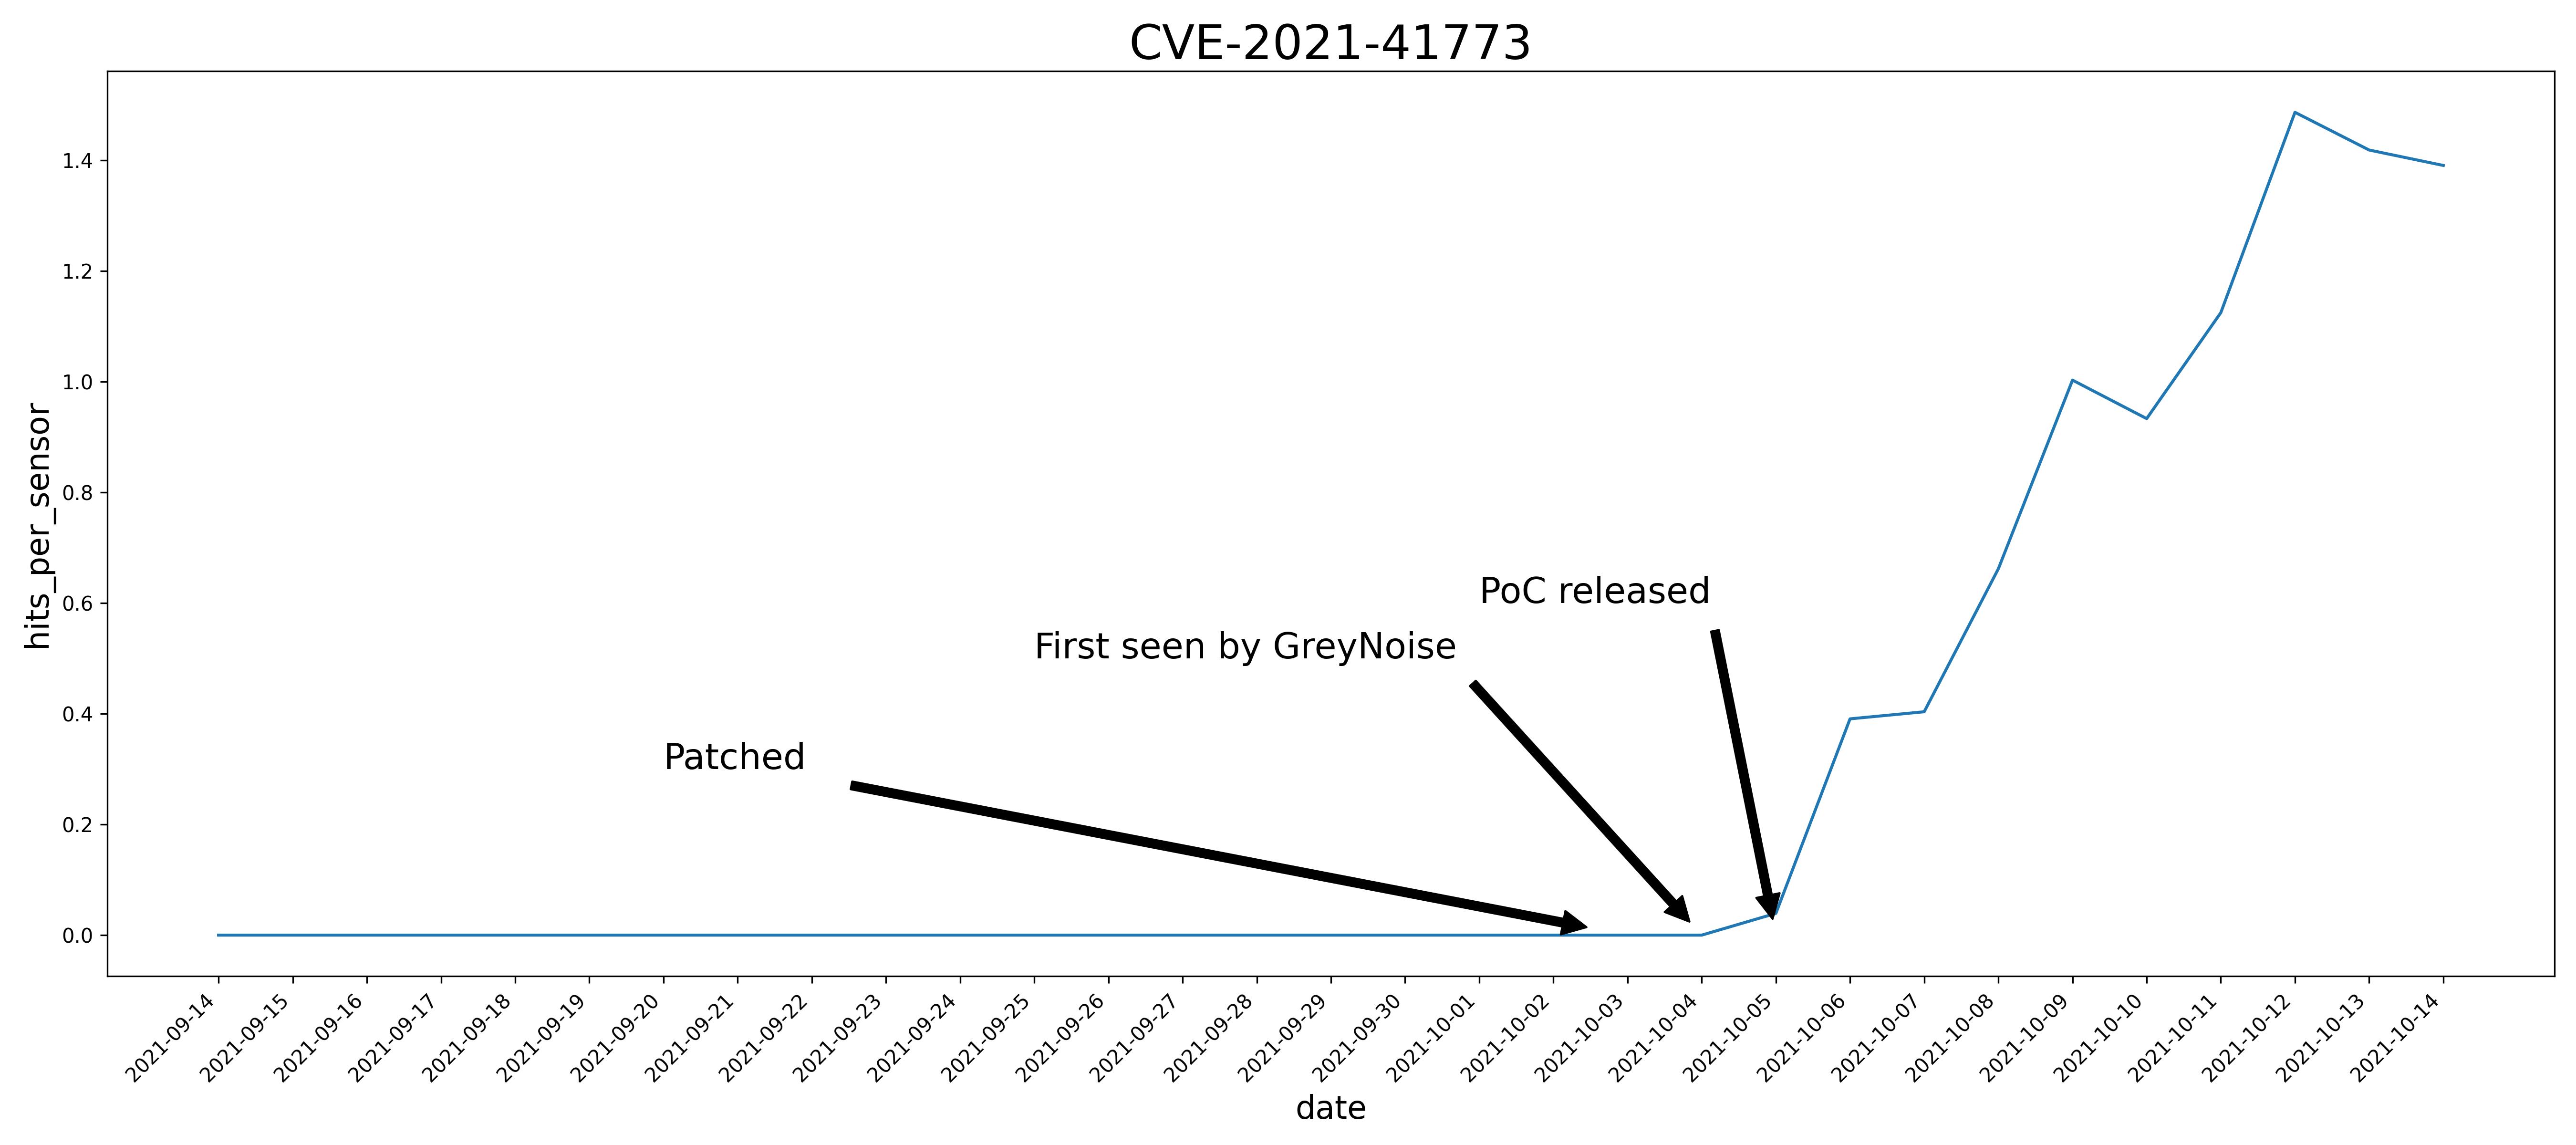 Figure 1: GreyNoise Timeline of CVE-2021-41773